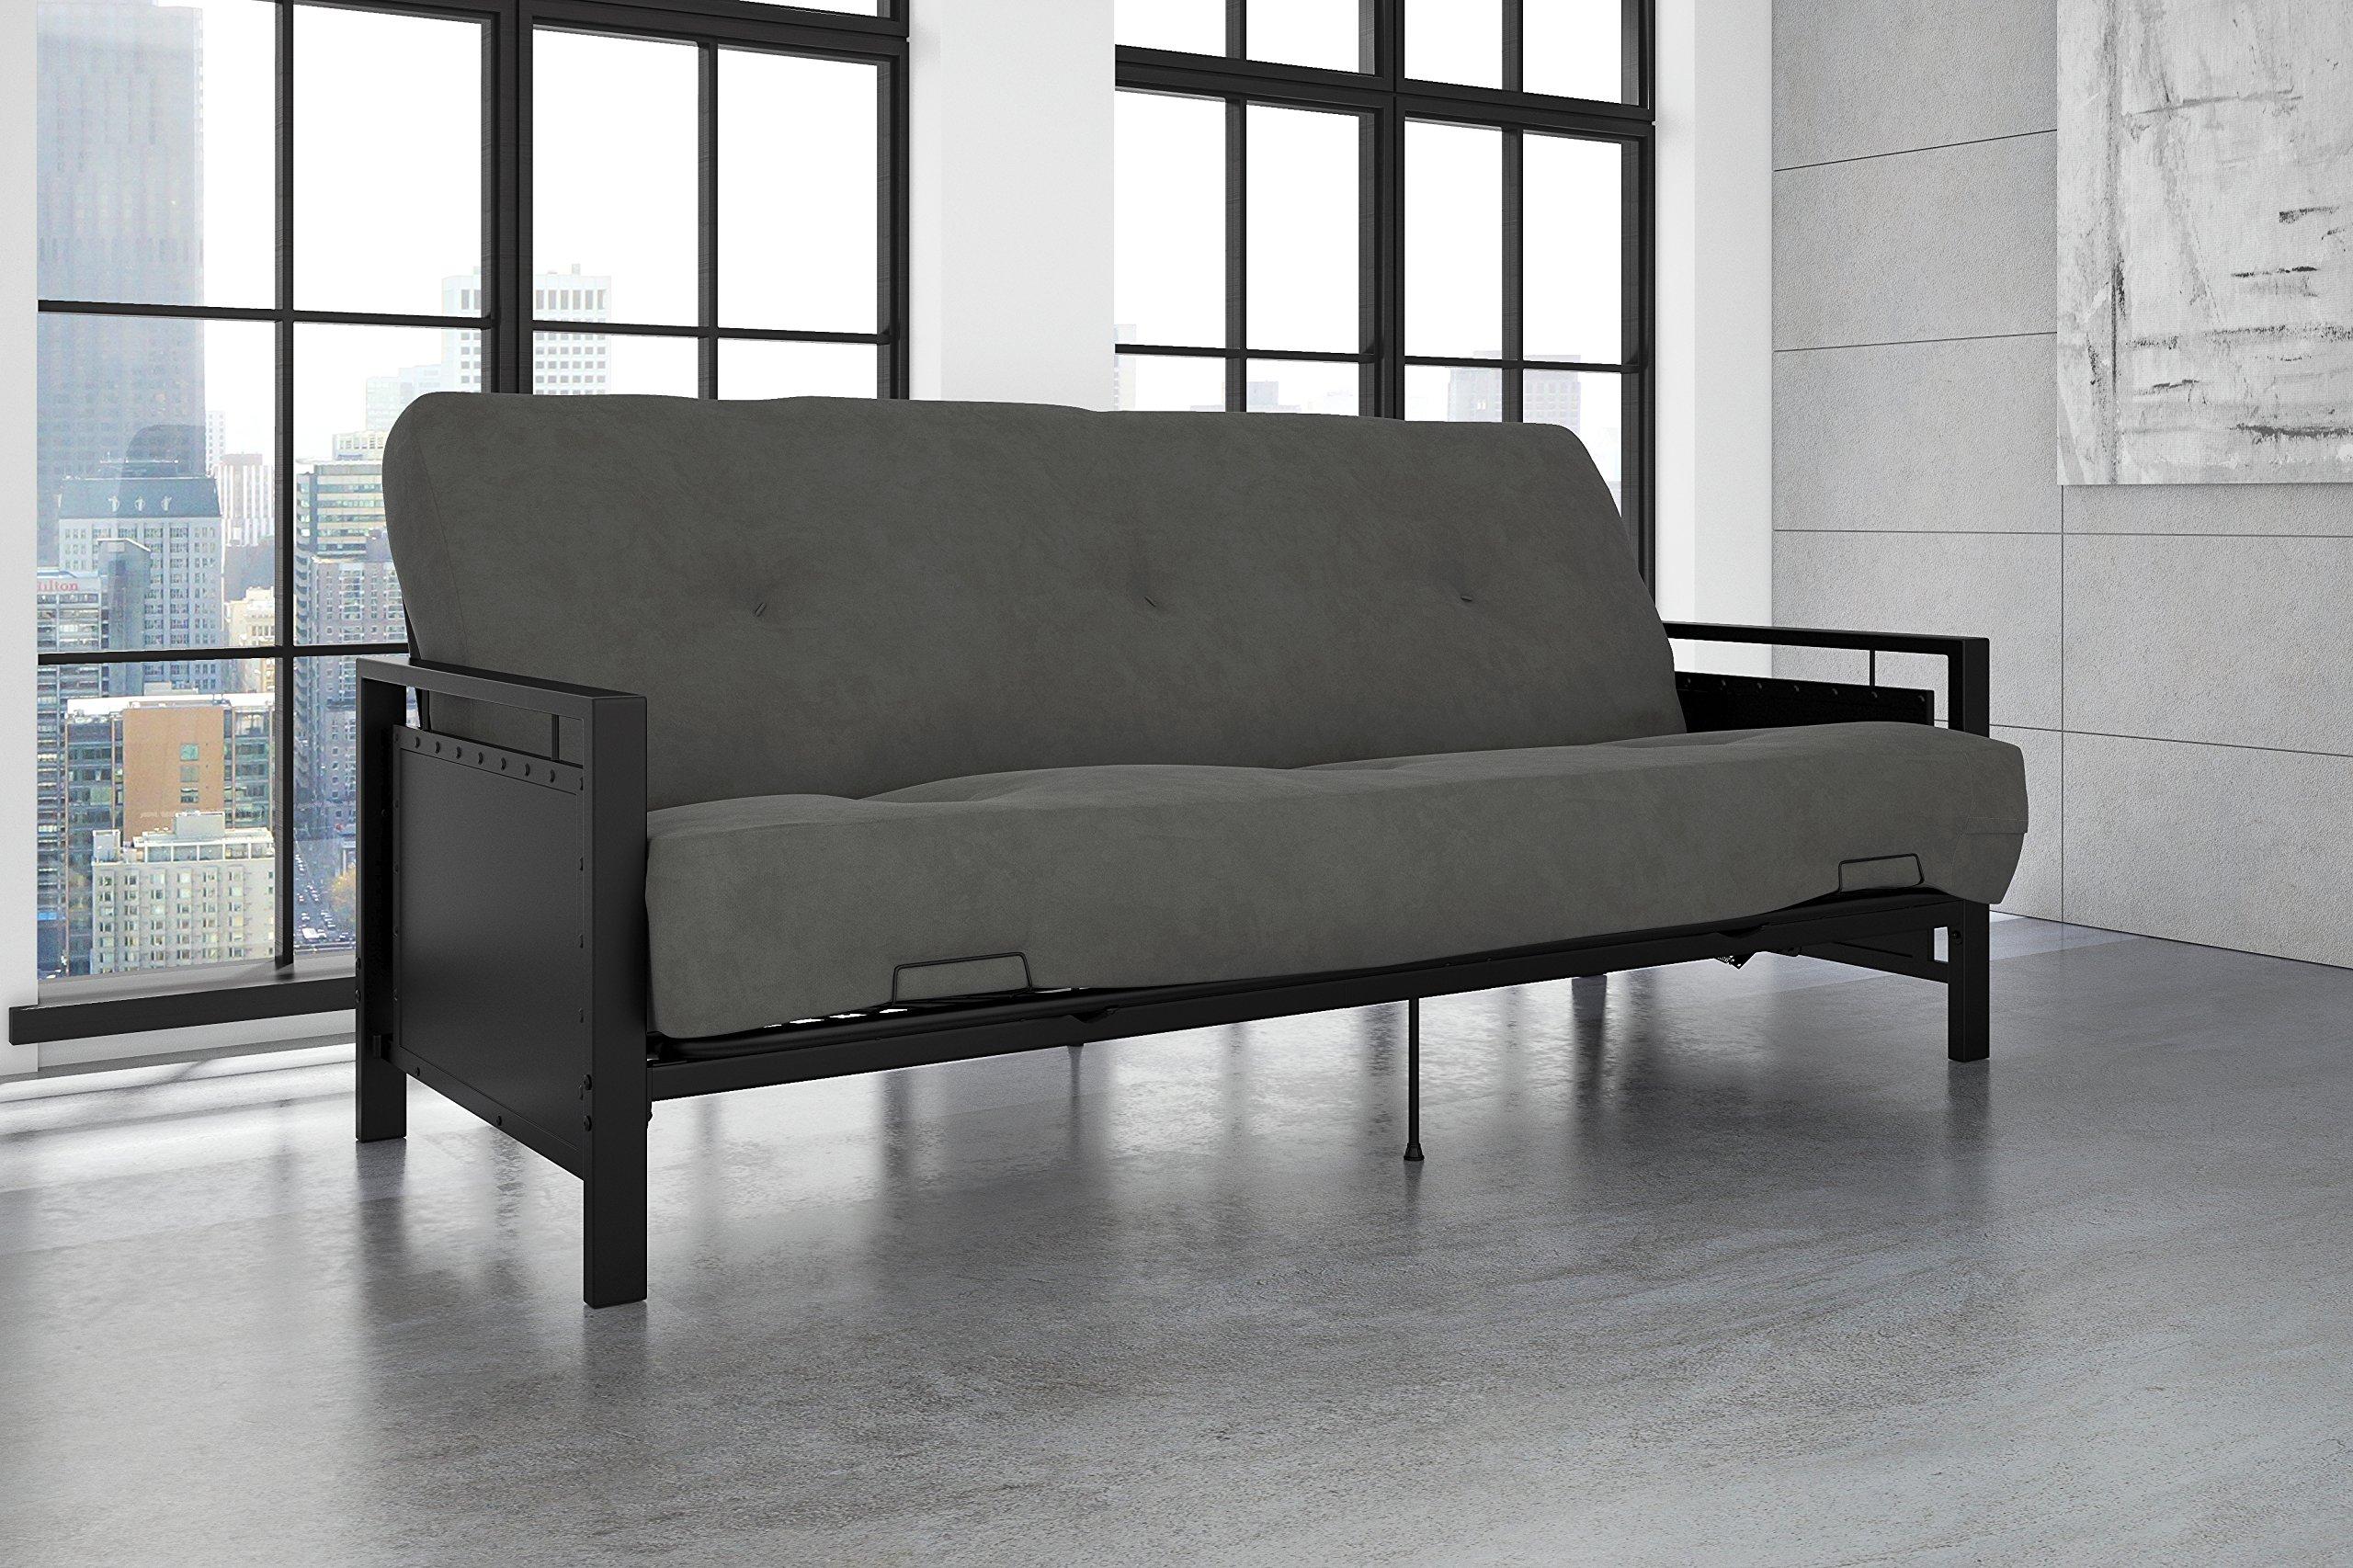 DHP Henley Metal Arm Futon Frame, Industrial Loft Design, Converts to Sleeper, Black Sturdy Metal by DHP (Image #3)